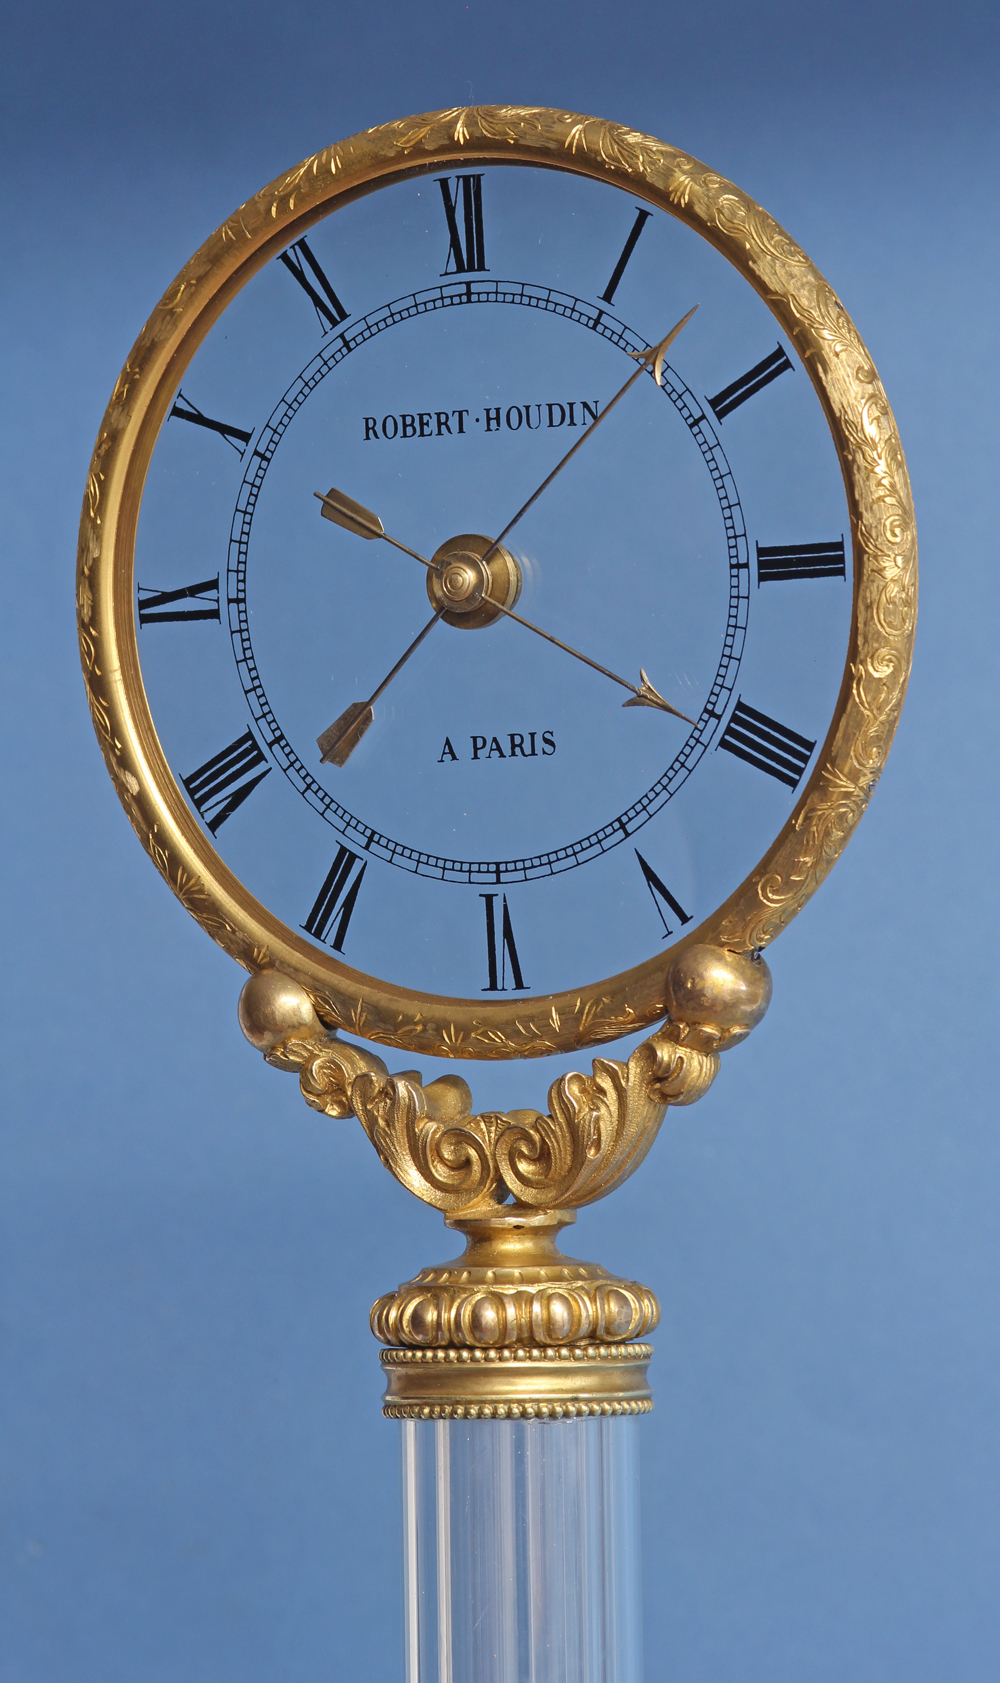 Robert-Houdin Mystery Clock